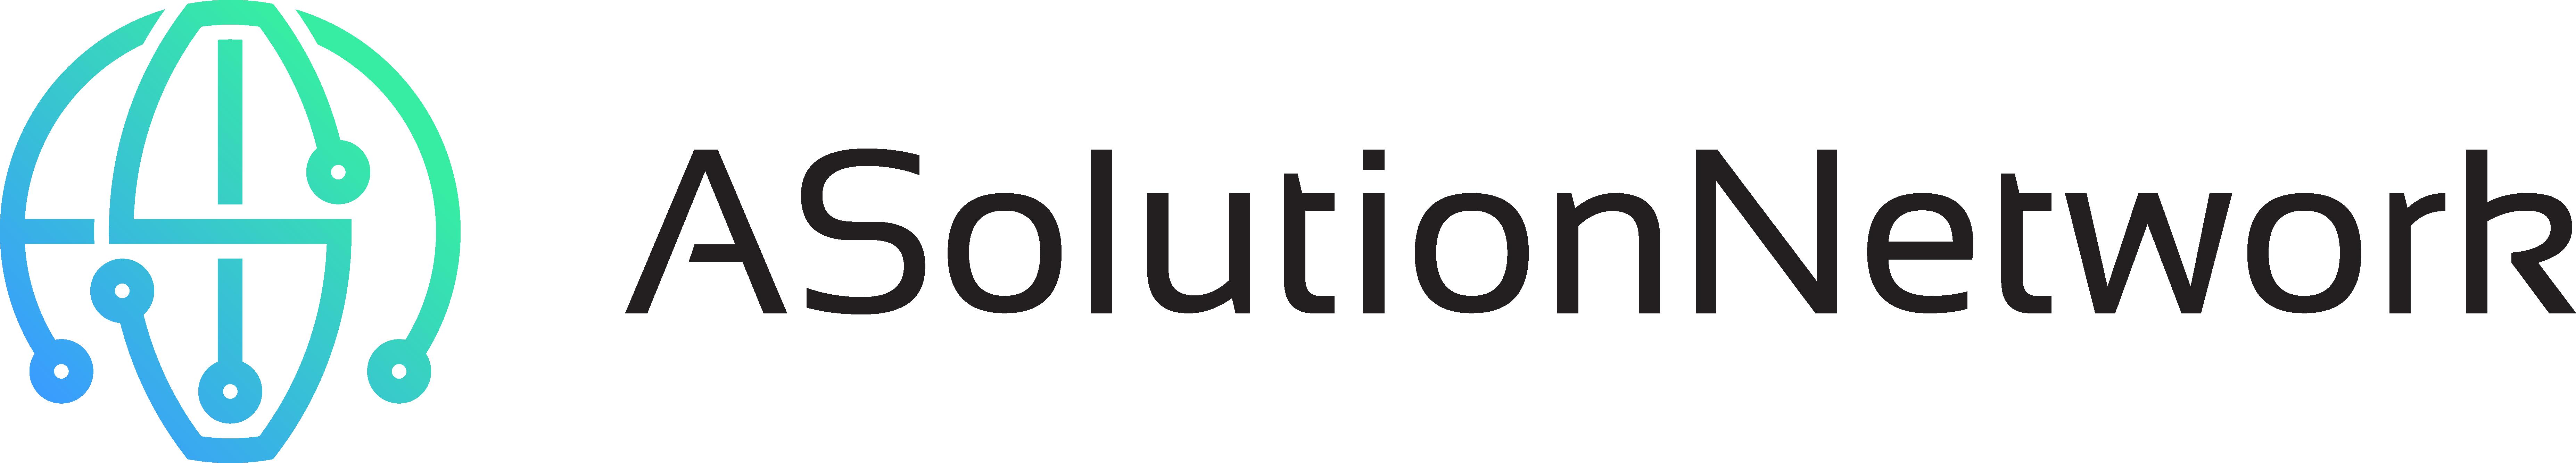 ASolutionNetwork